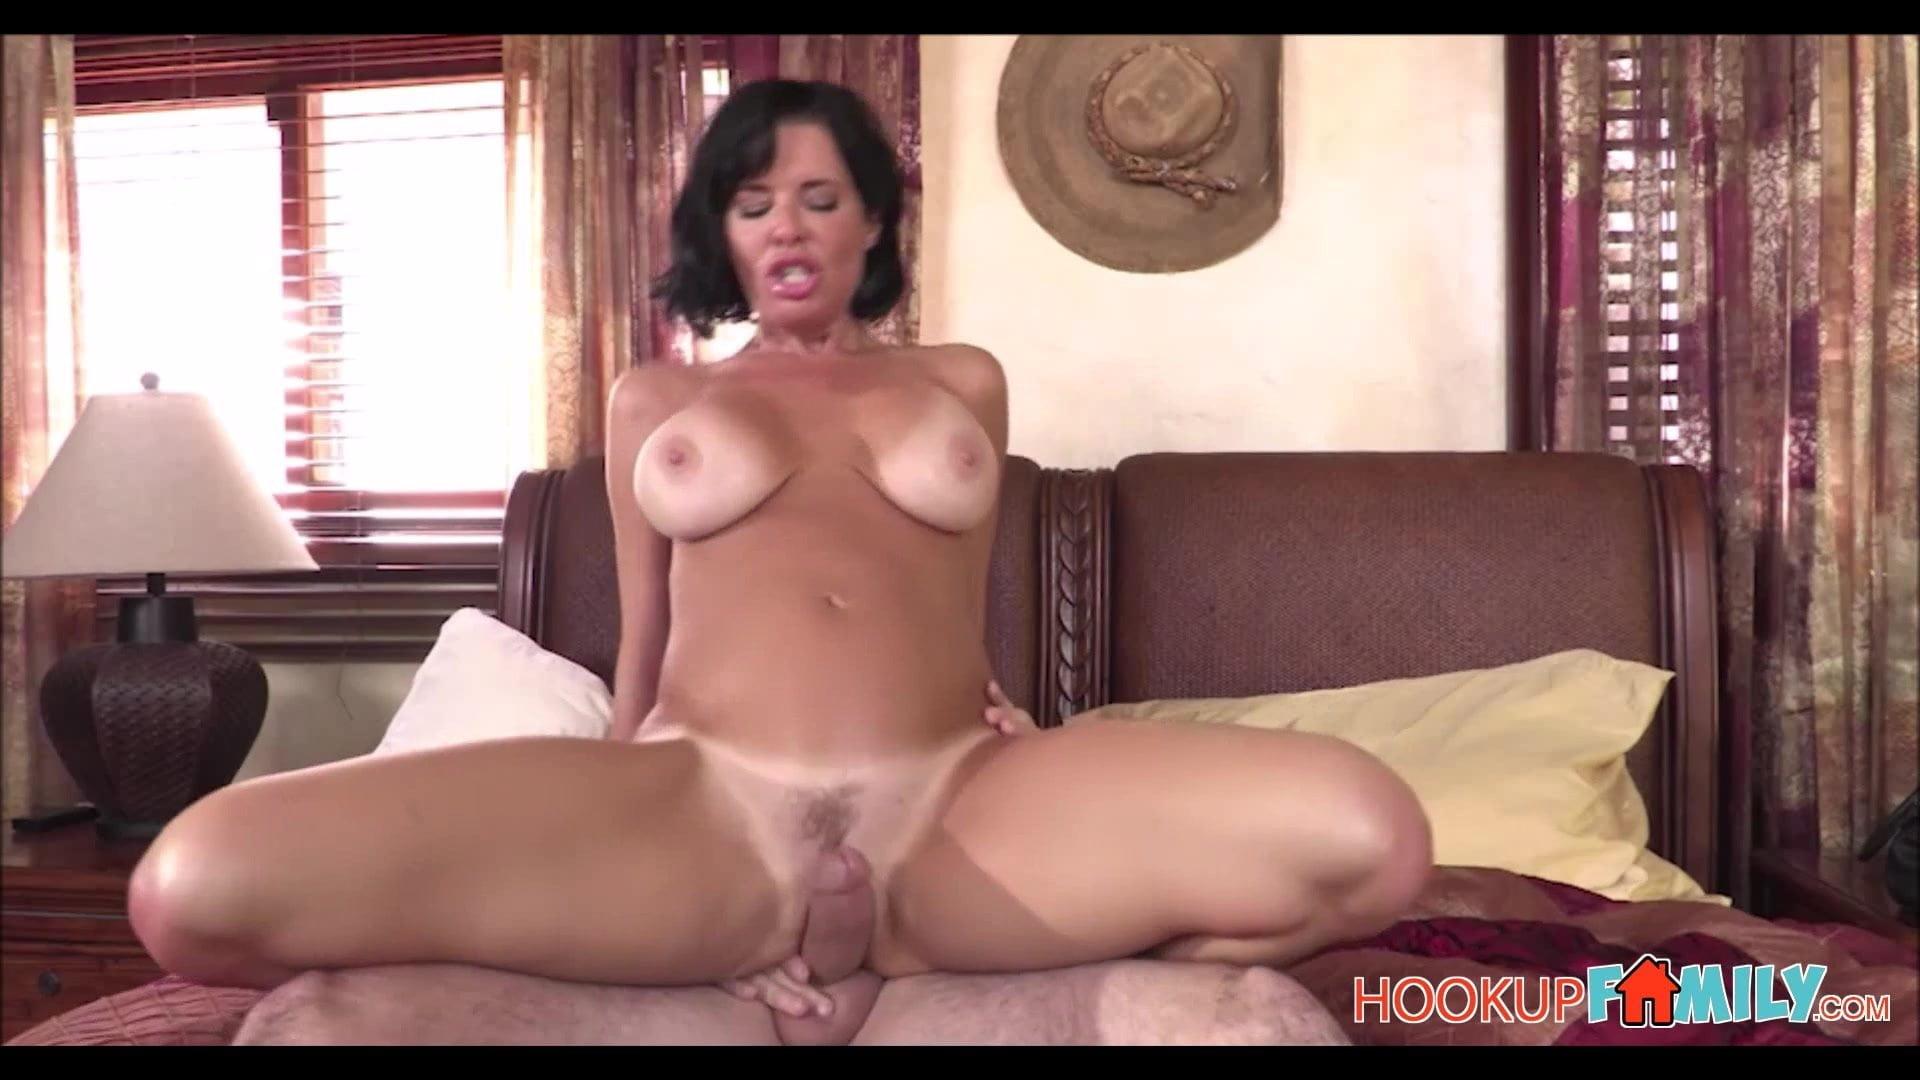 Horny Big Tits Milf Step Mom Veronica Avluv Has Sex With-9450